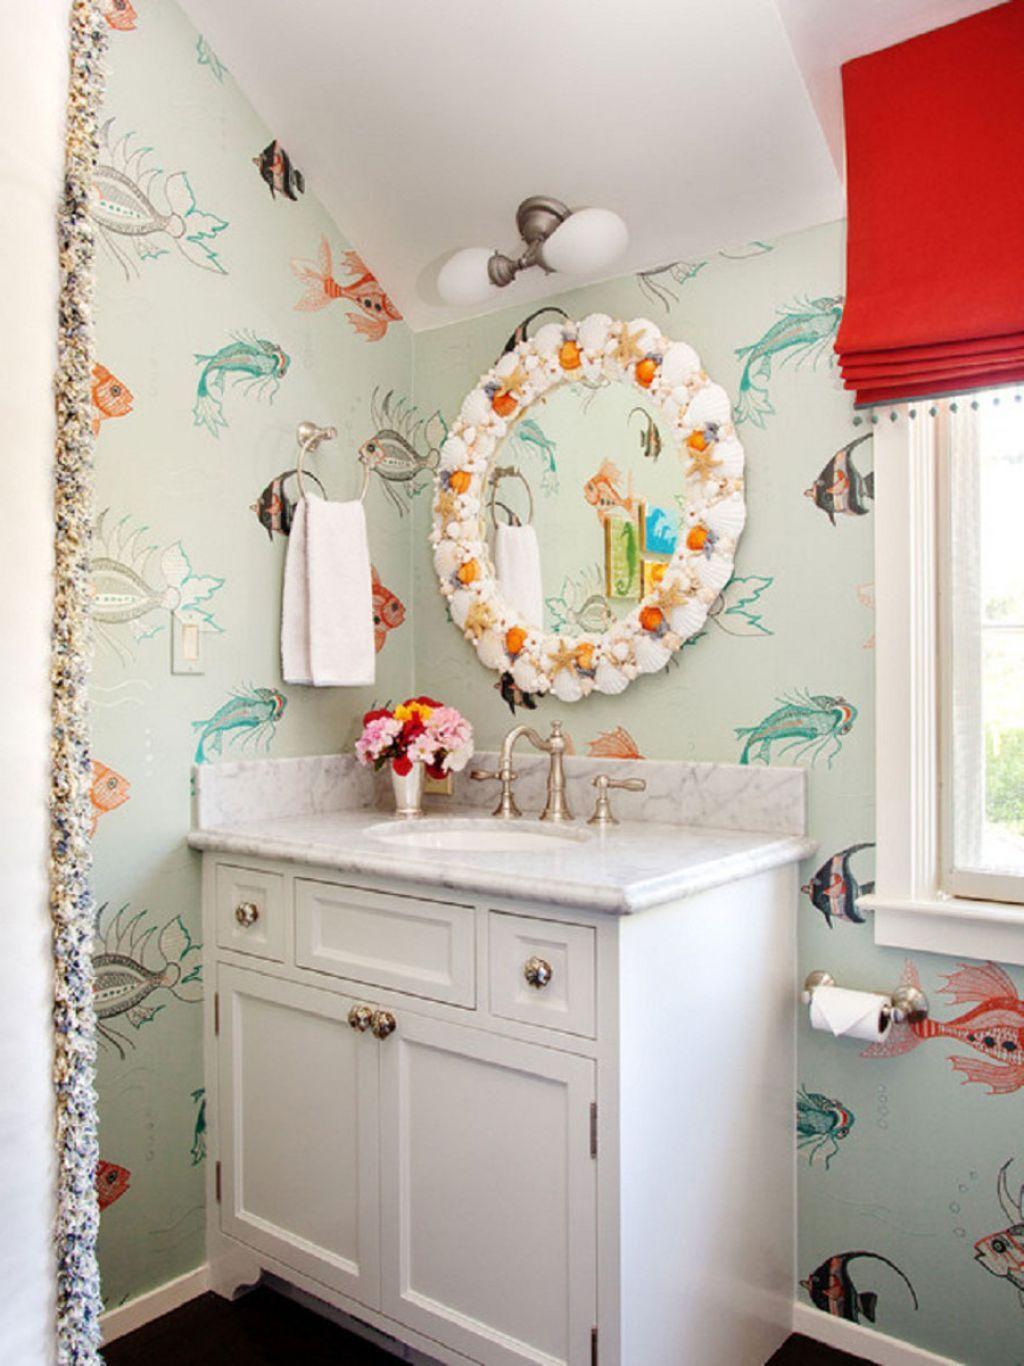 The Kids Bathroom Mirror Gets Framed Kids Bathroom Girls